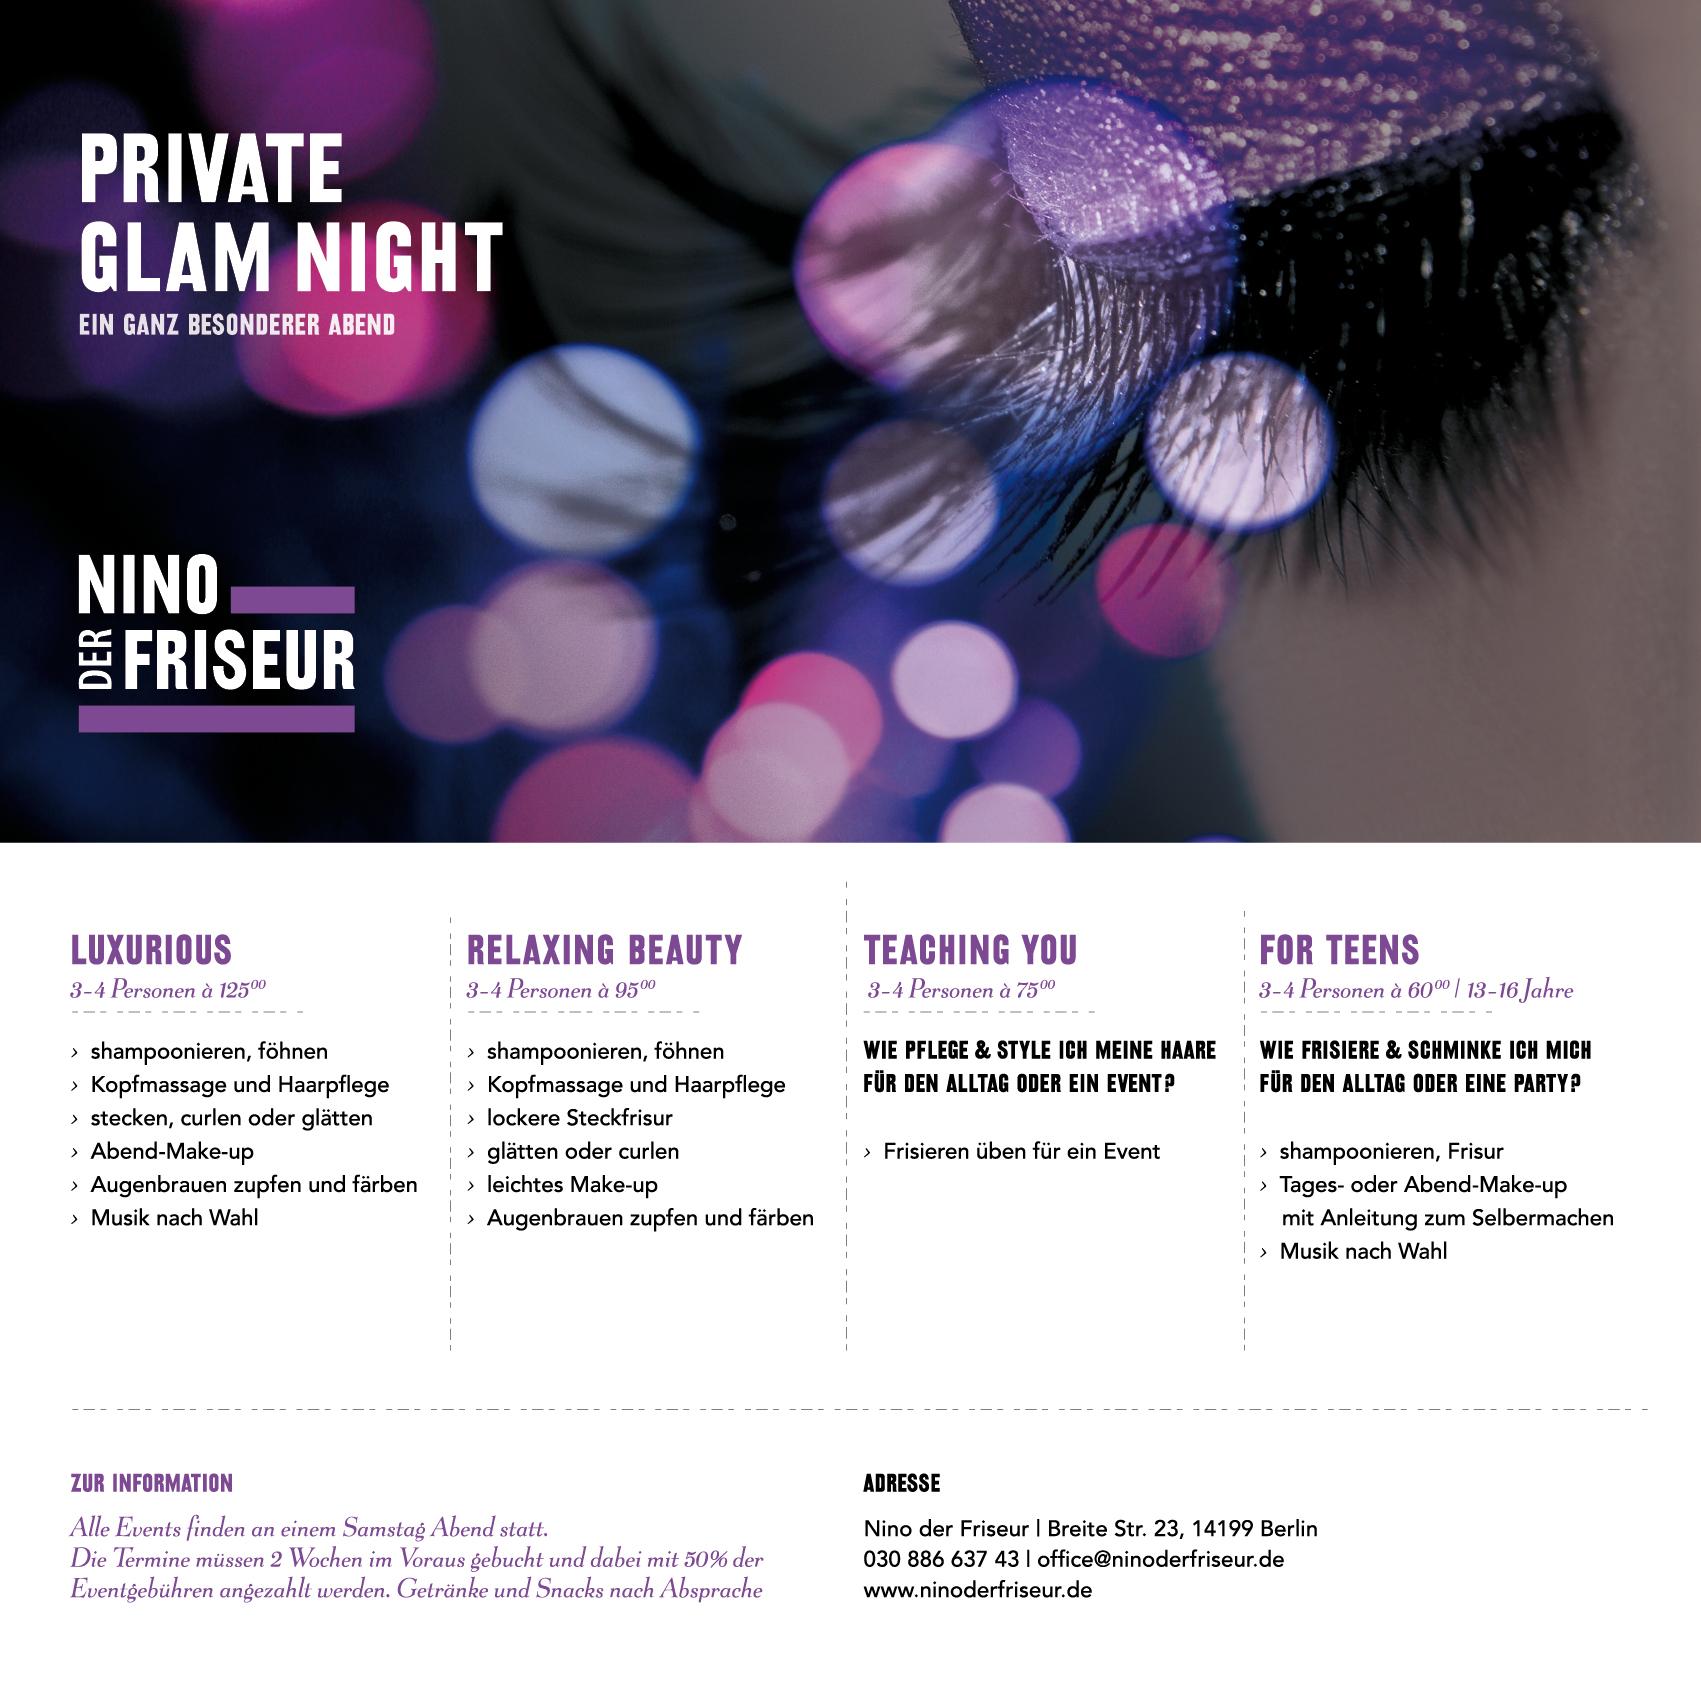 PRIVAT GLAM NIGHT